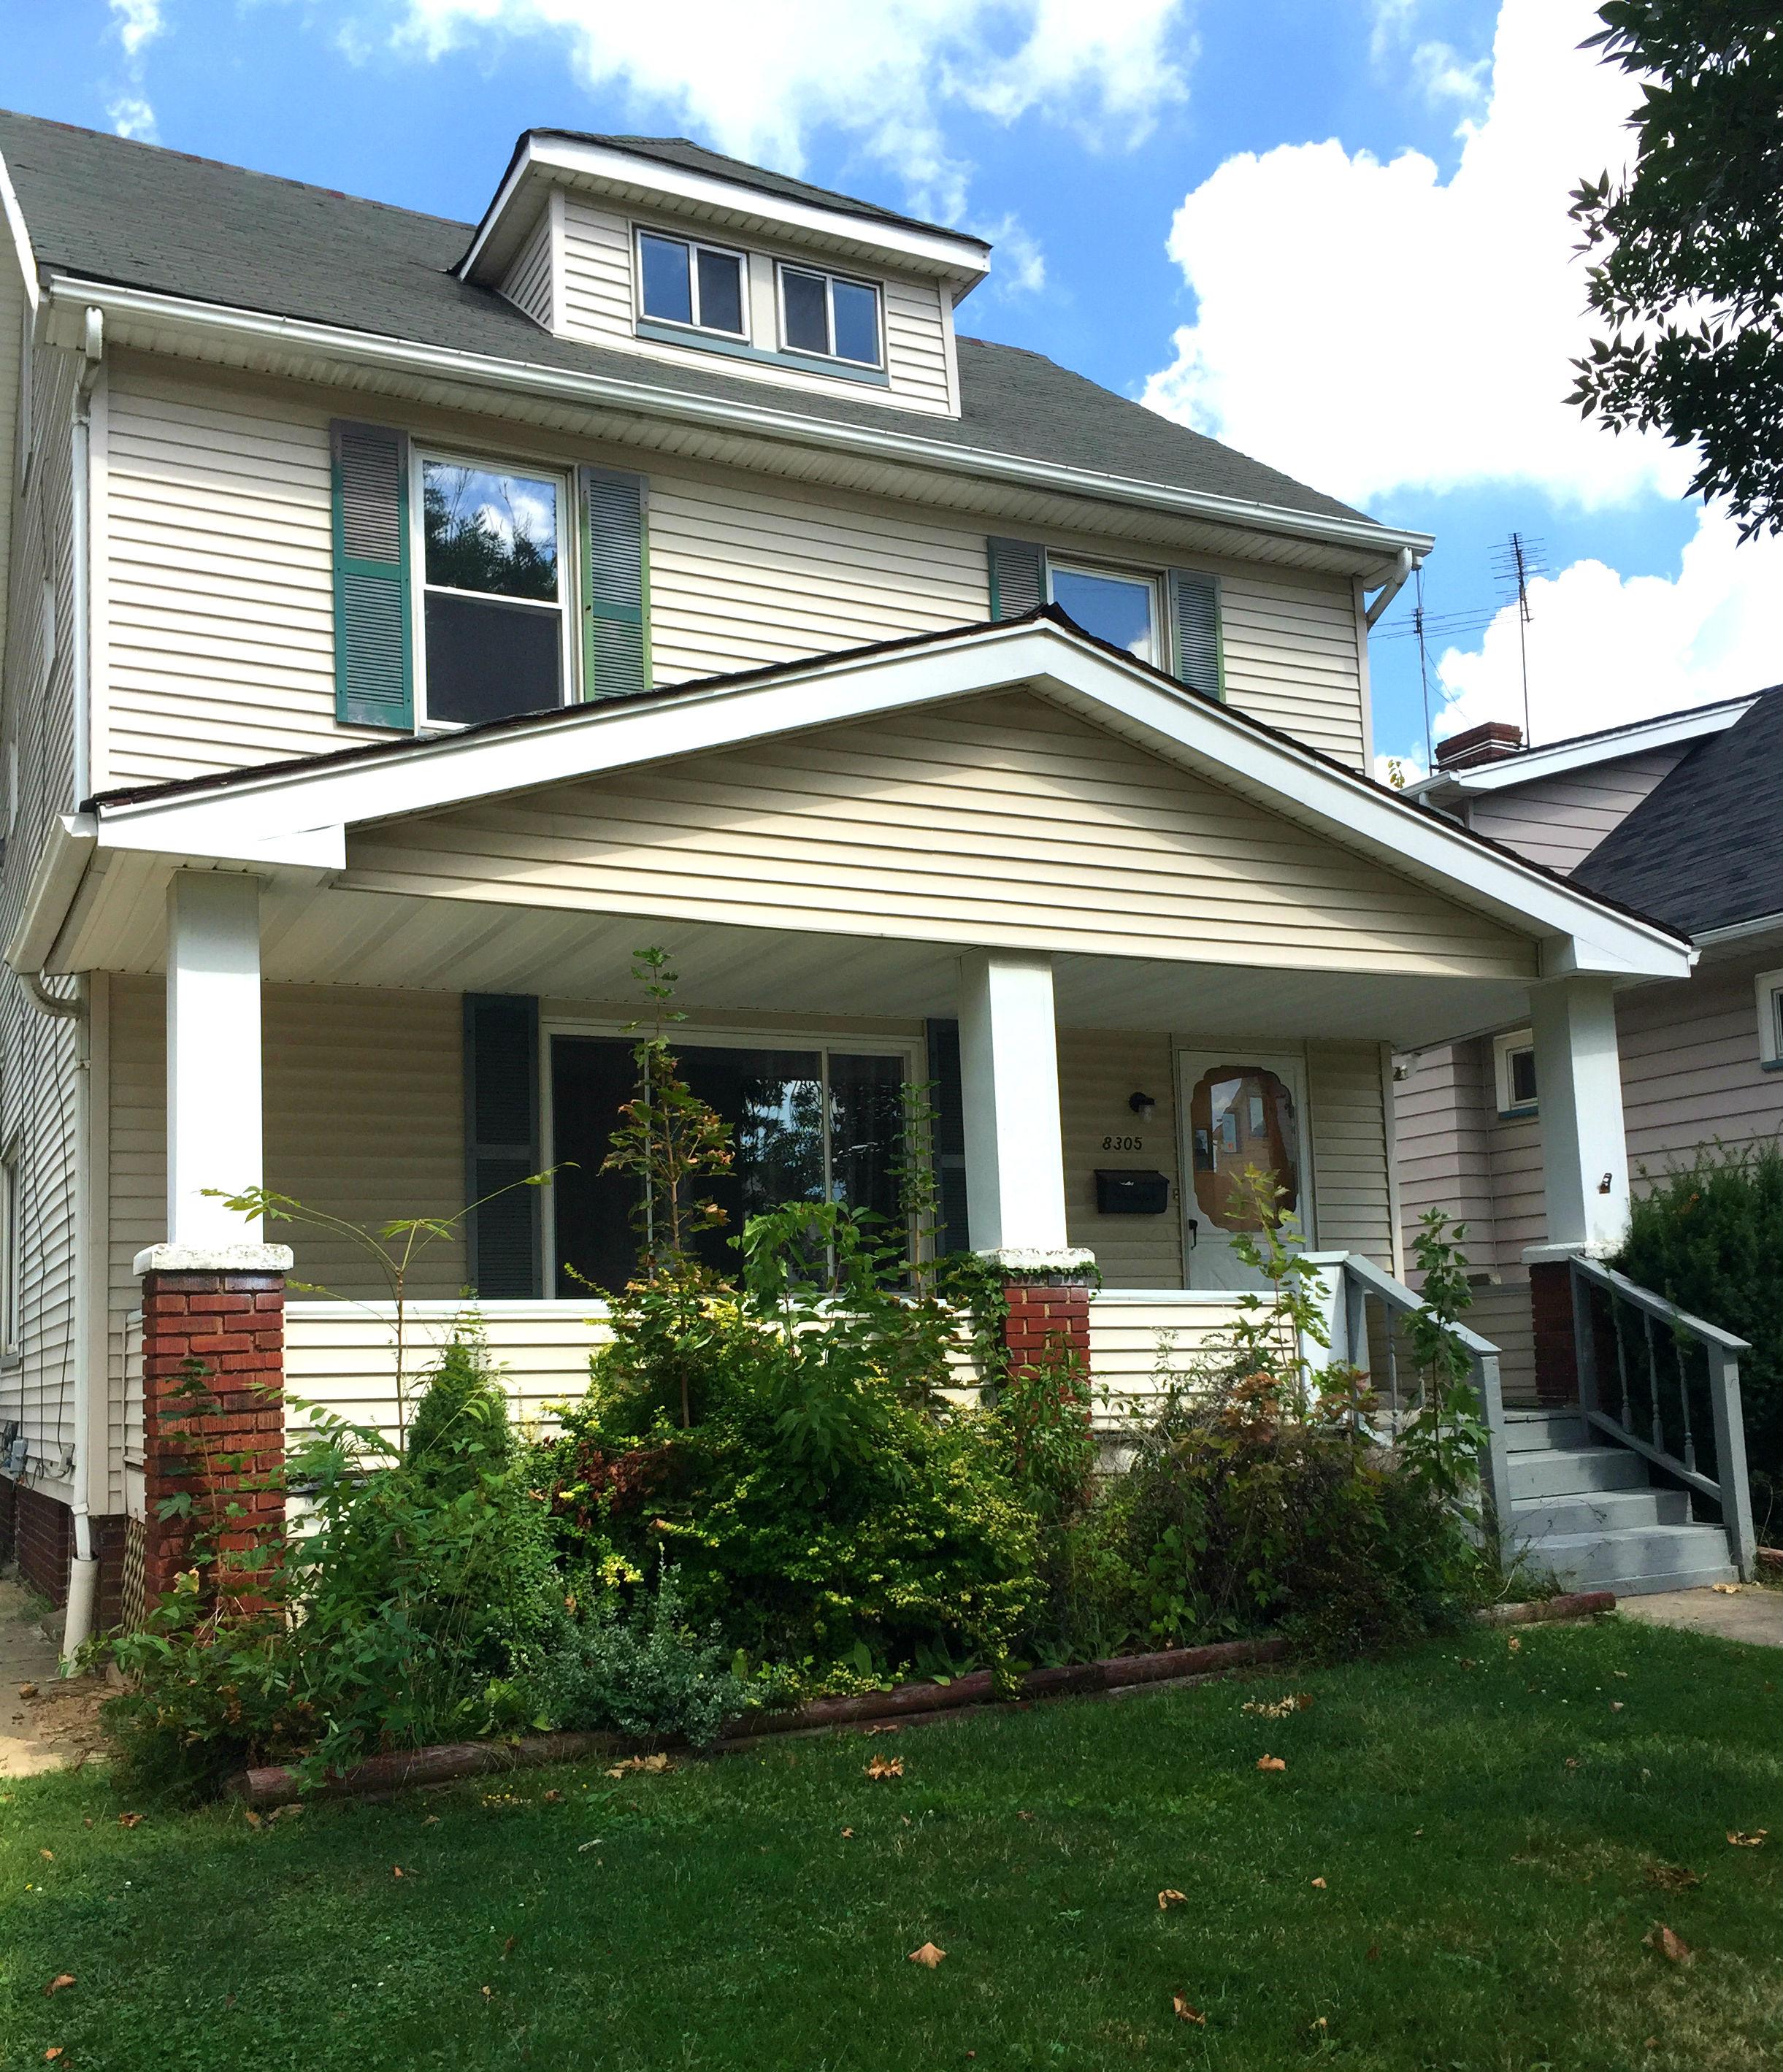 8305 Bancroft Ave., Cleveland | 4 bed 1 bath | 1,248 Sq. Ft. | $43,000